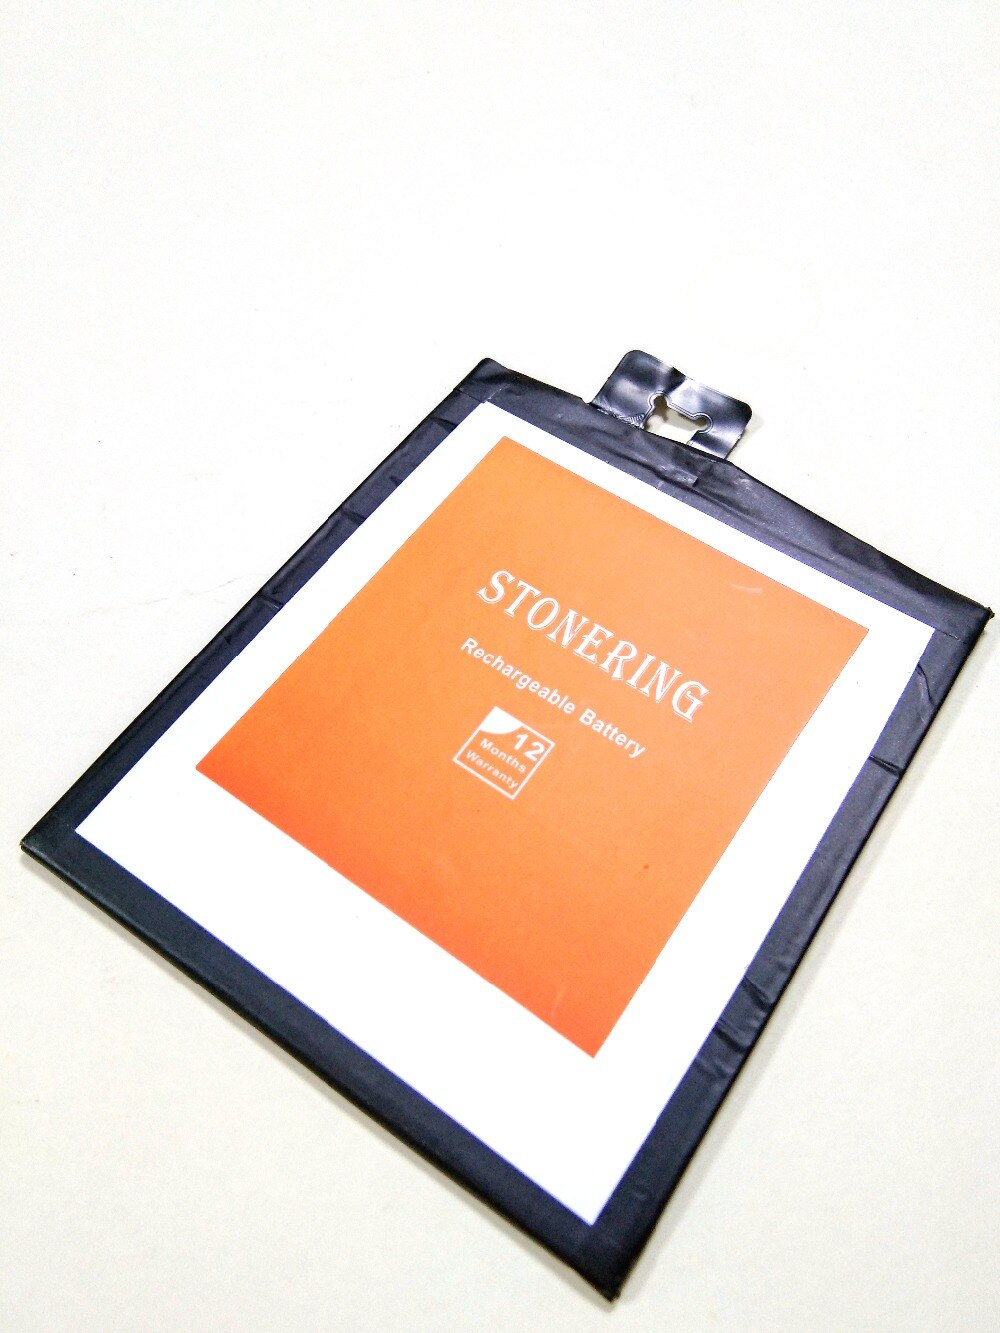 Batería de apedreamiento 3500mAh L14D1P31 para Lenovo PB1-770N PB1-770N/M PHAB Plus Tablet